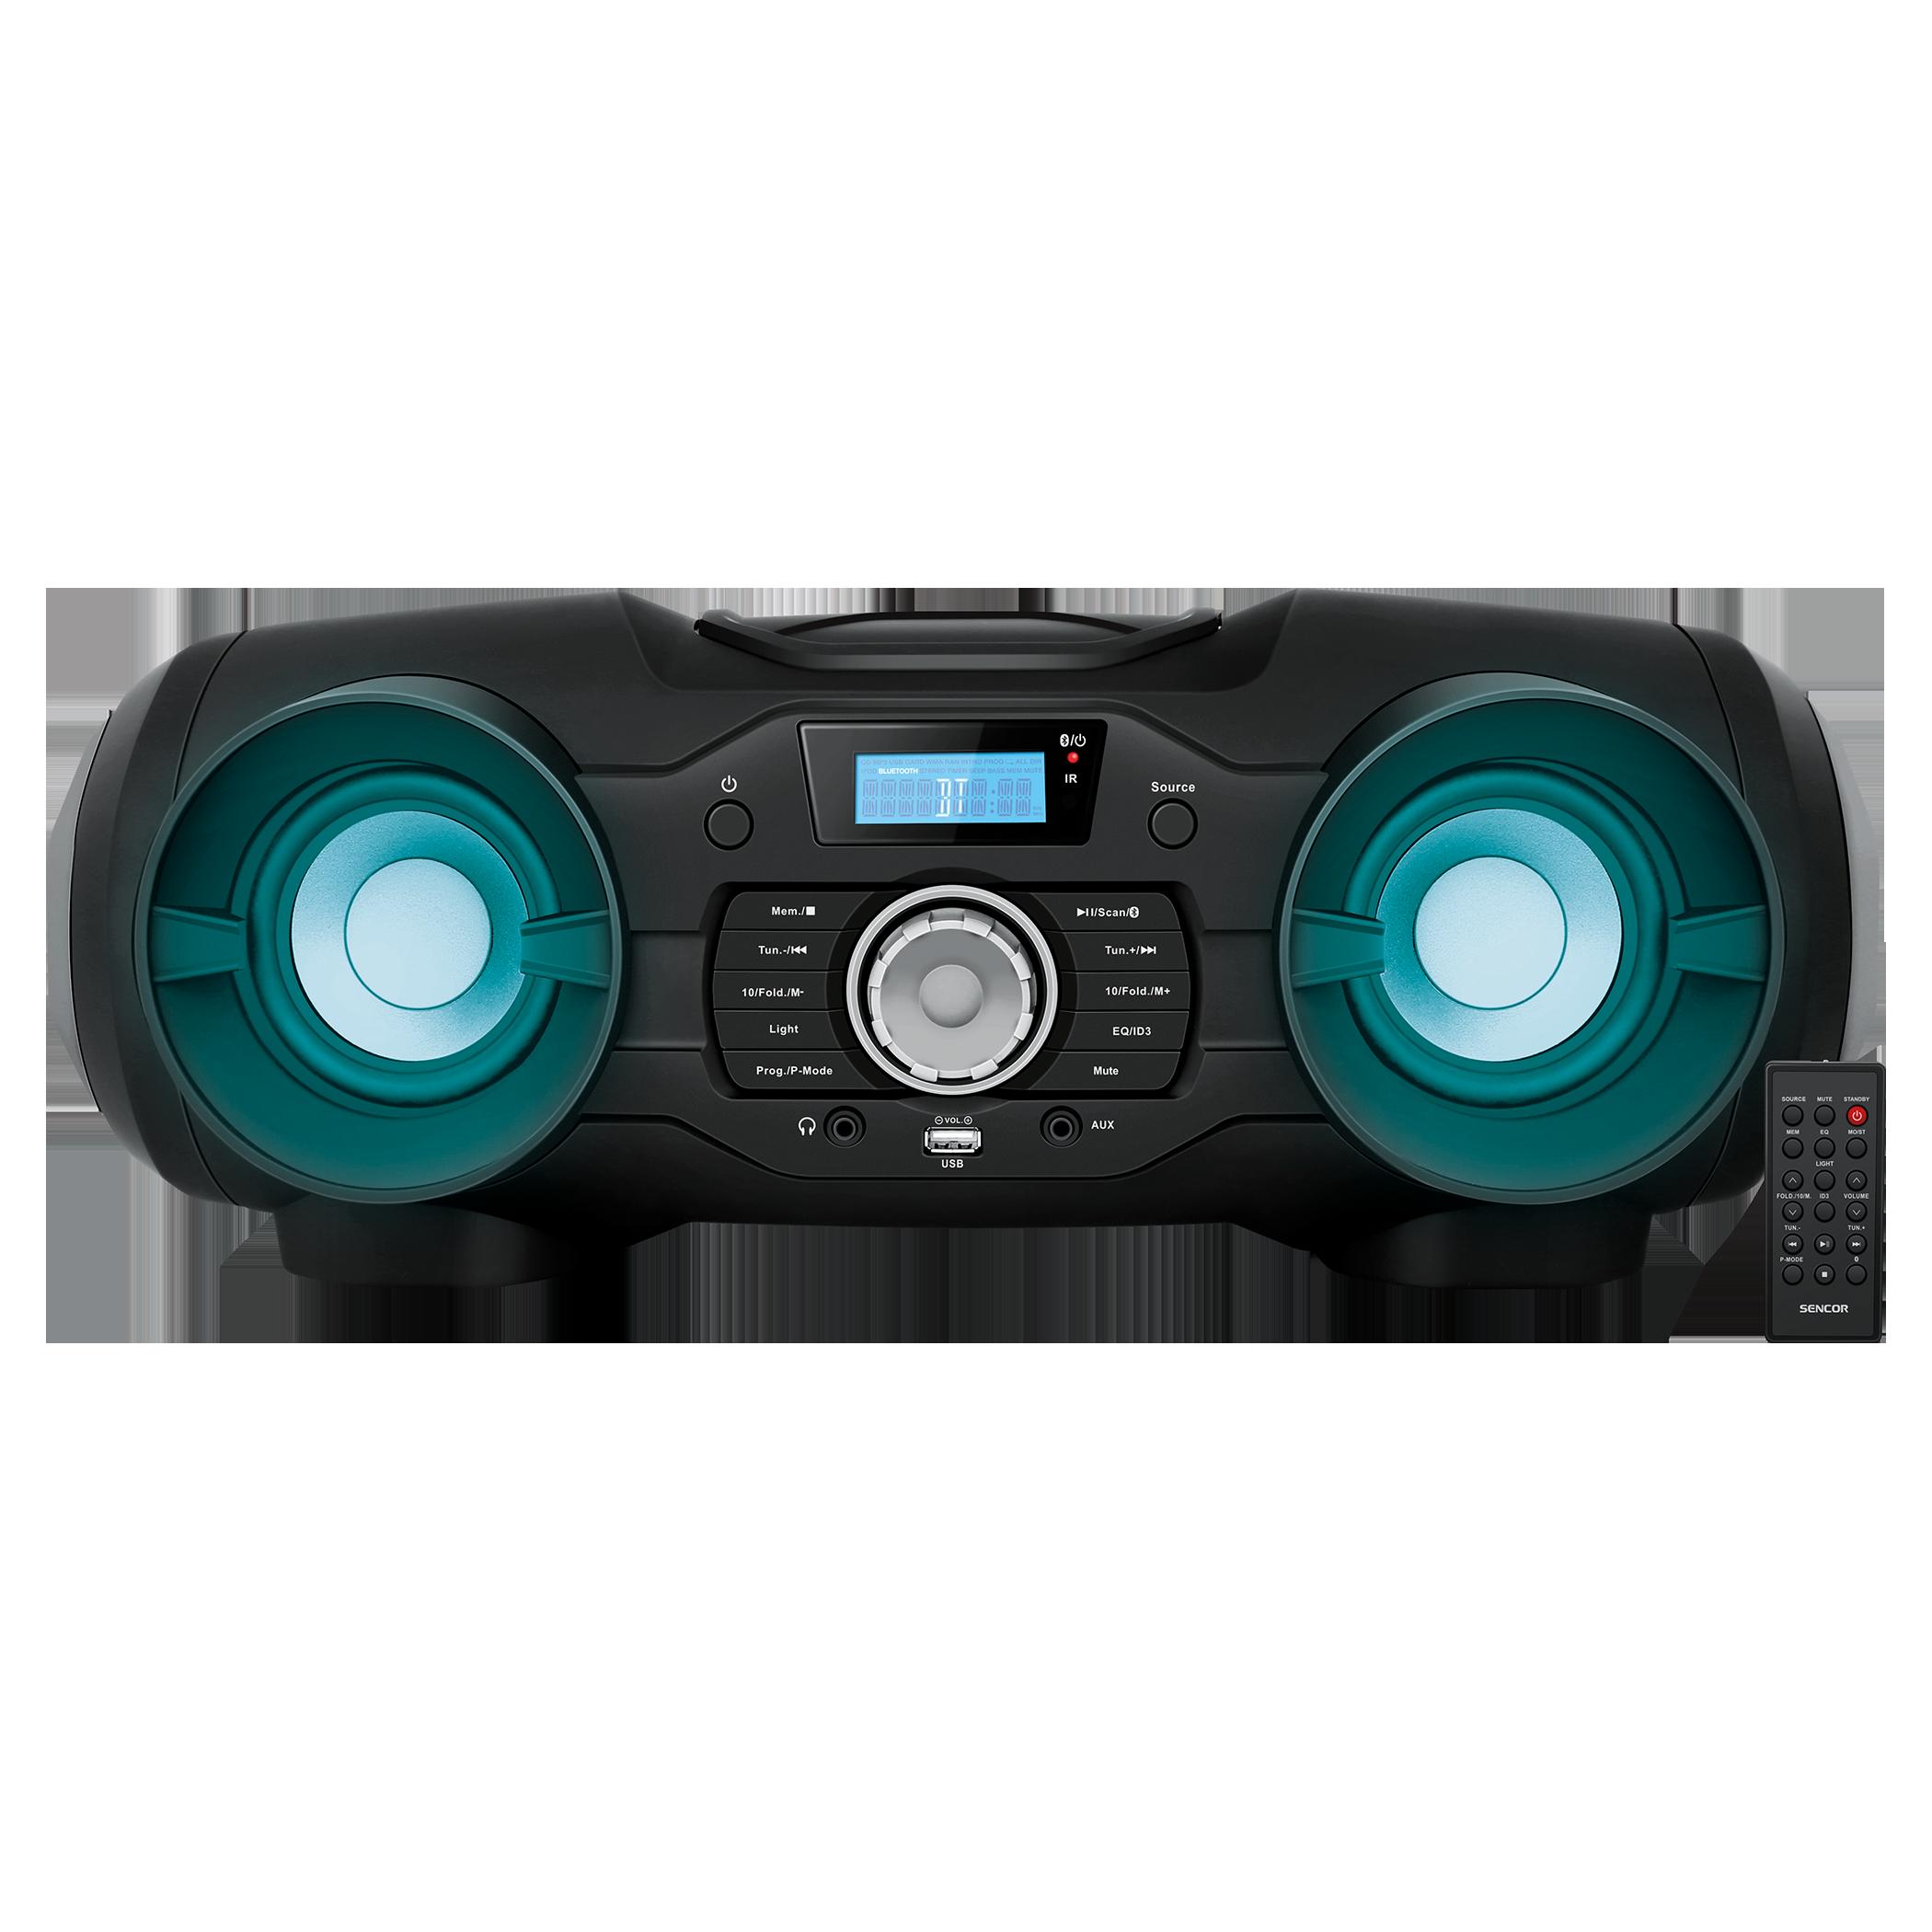 Boombox CD/MP3/USB/BT/AUX SENCOR SPT 5800 magnetola